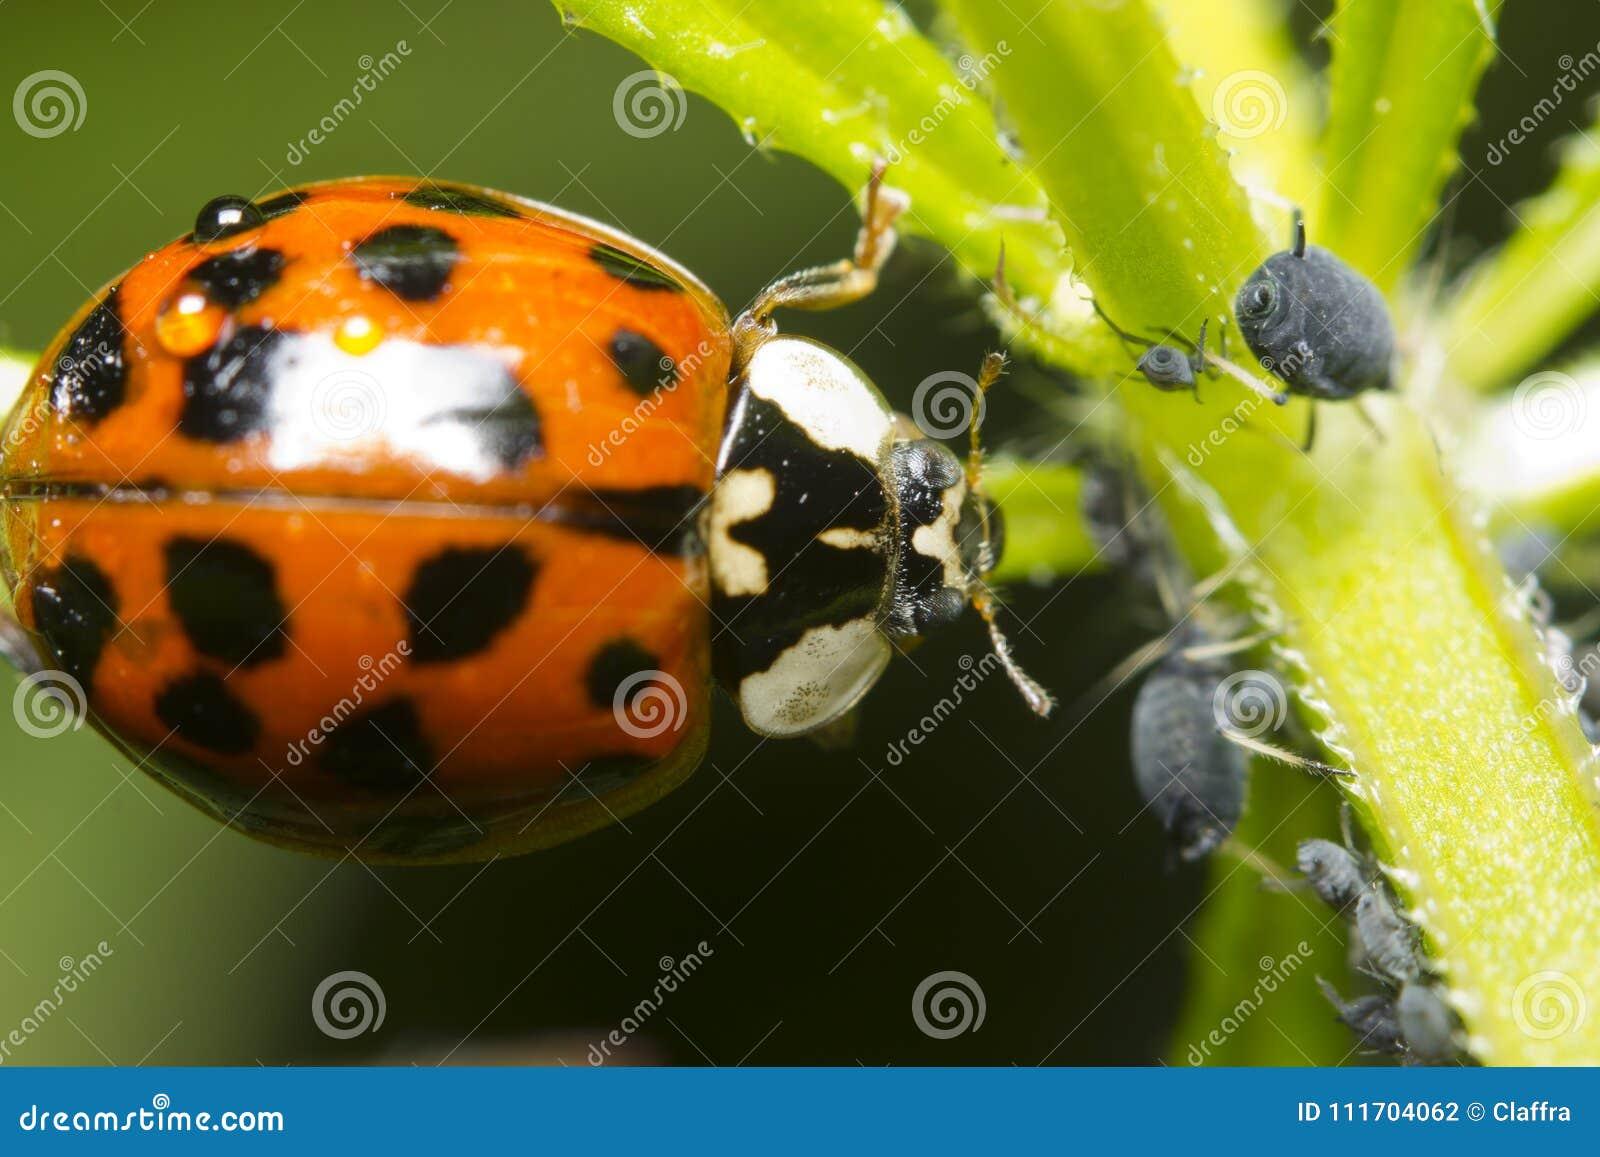 瓢虫和蚜虫